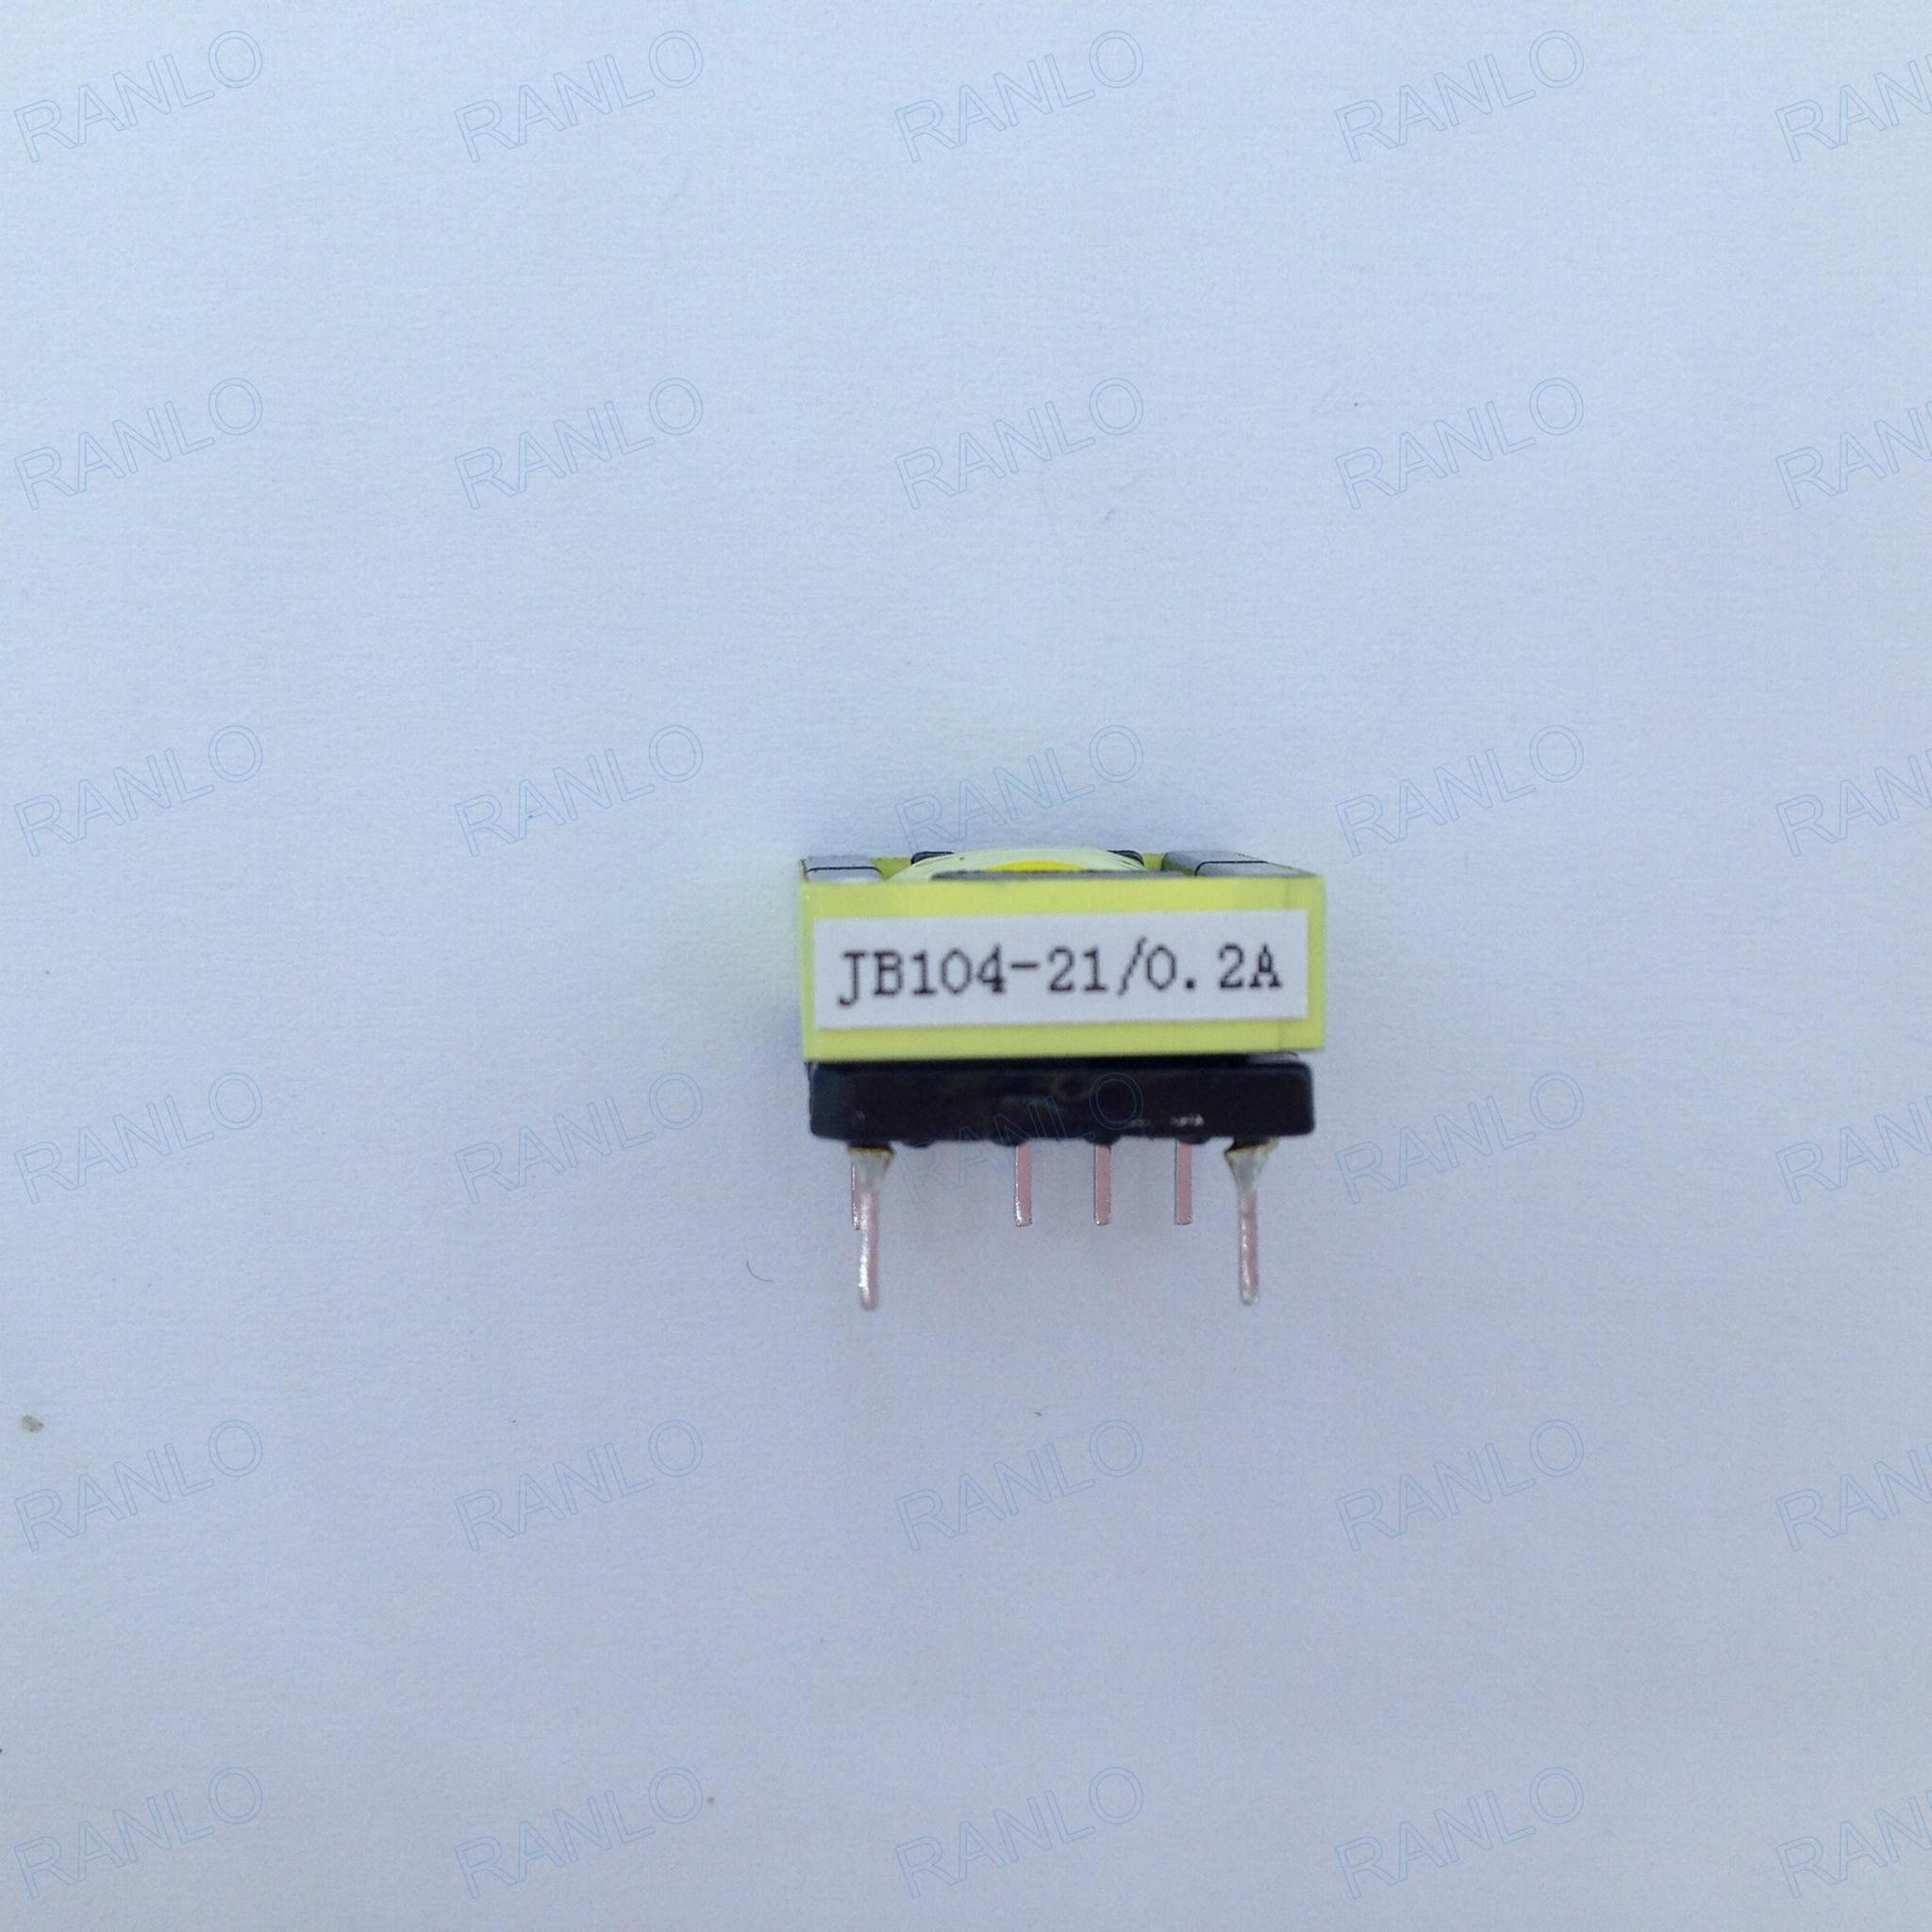 EPC13 5+5  高頻脈衝開關電源變壓器 驅動變壓器 2